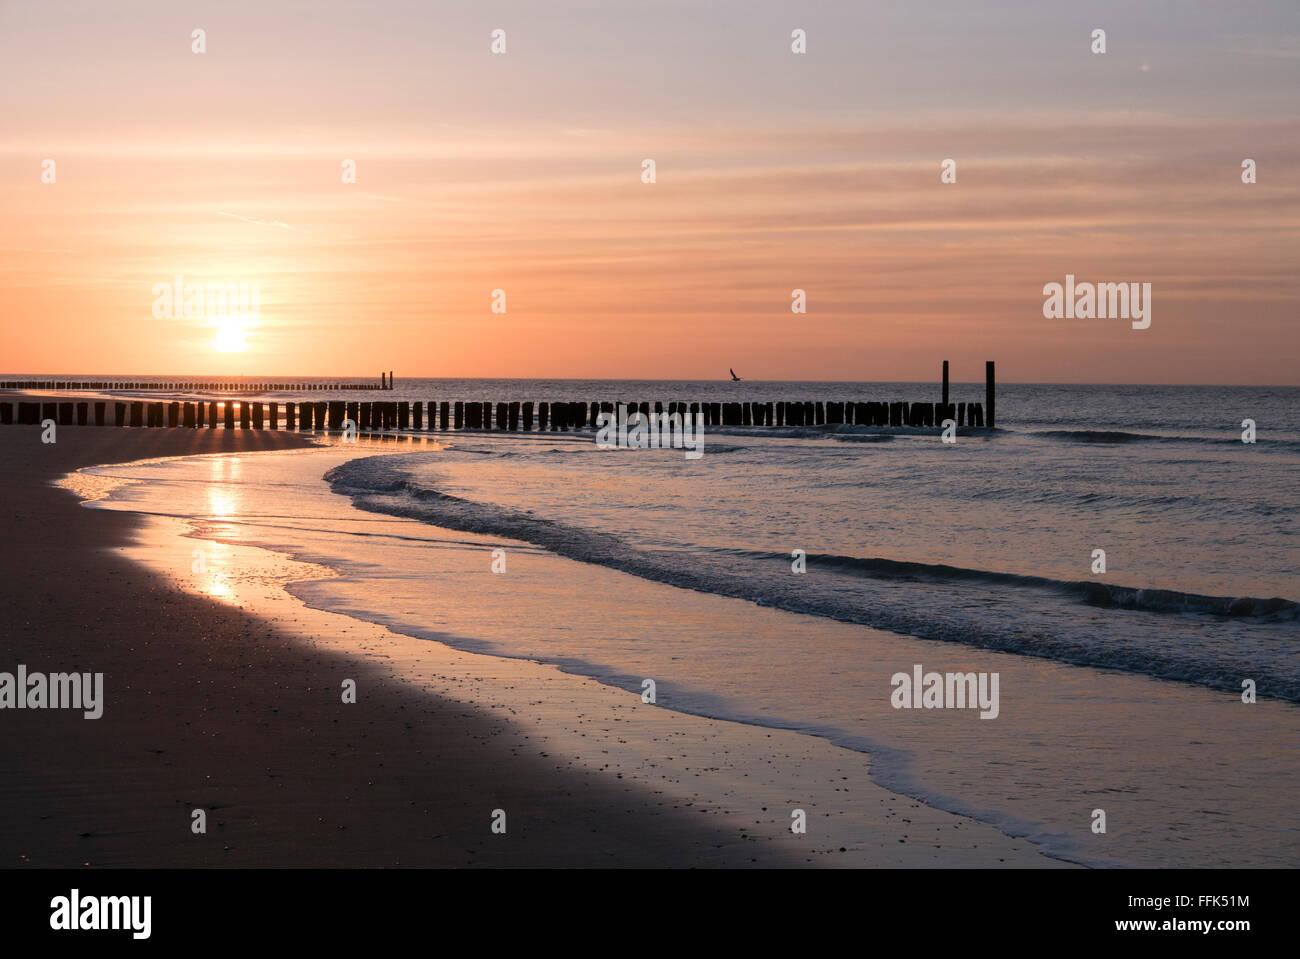 Strand nordsee sonnenuntergang  Strang, Raummotive, Domburg, Nordsee-Küste, Provinz Seeland ...